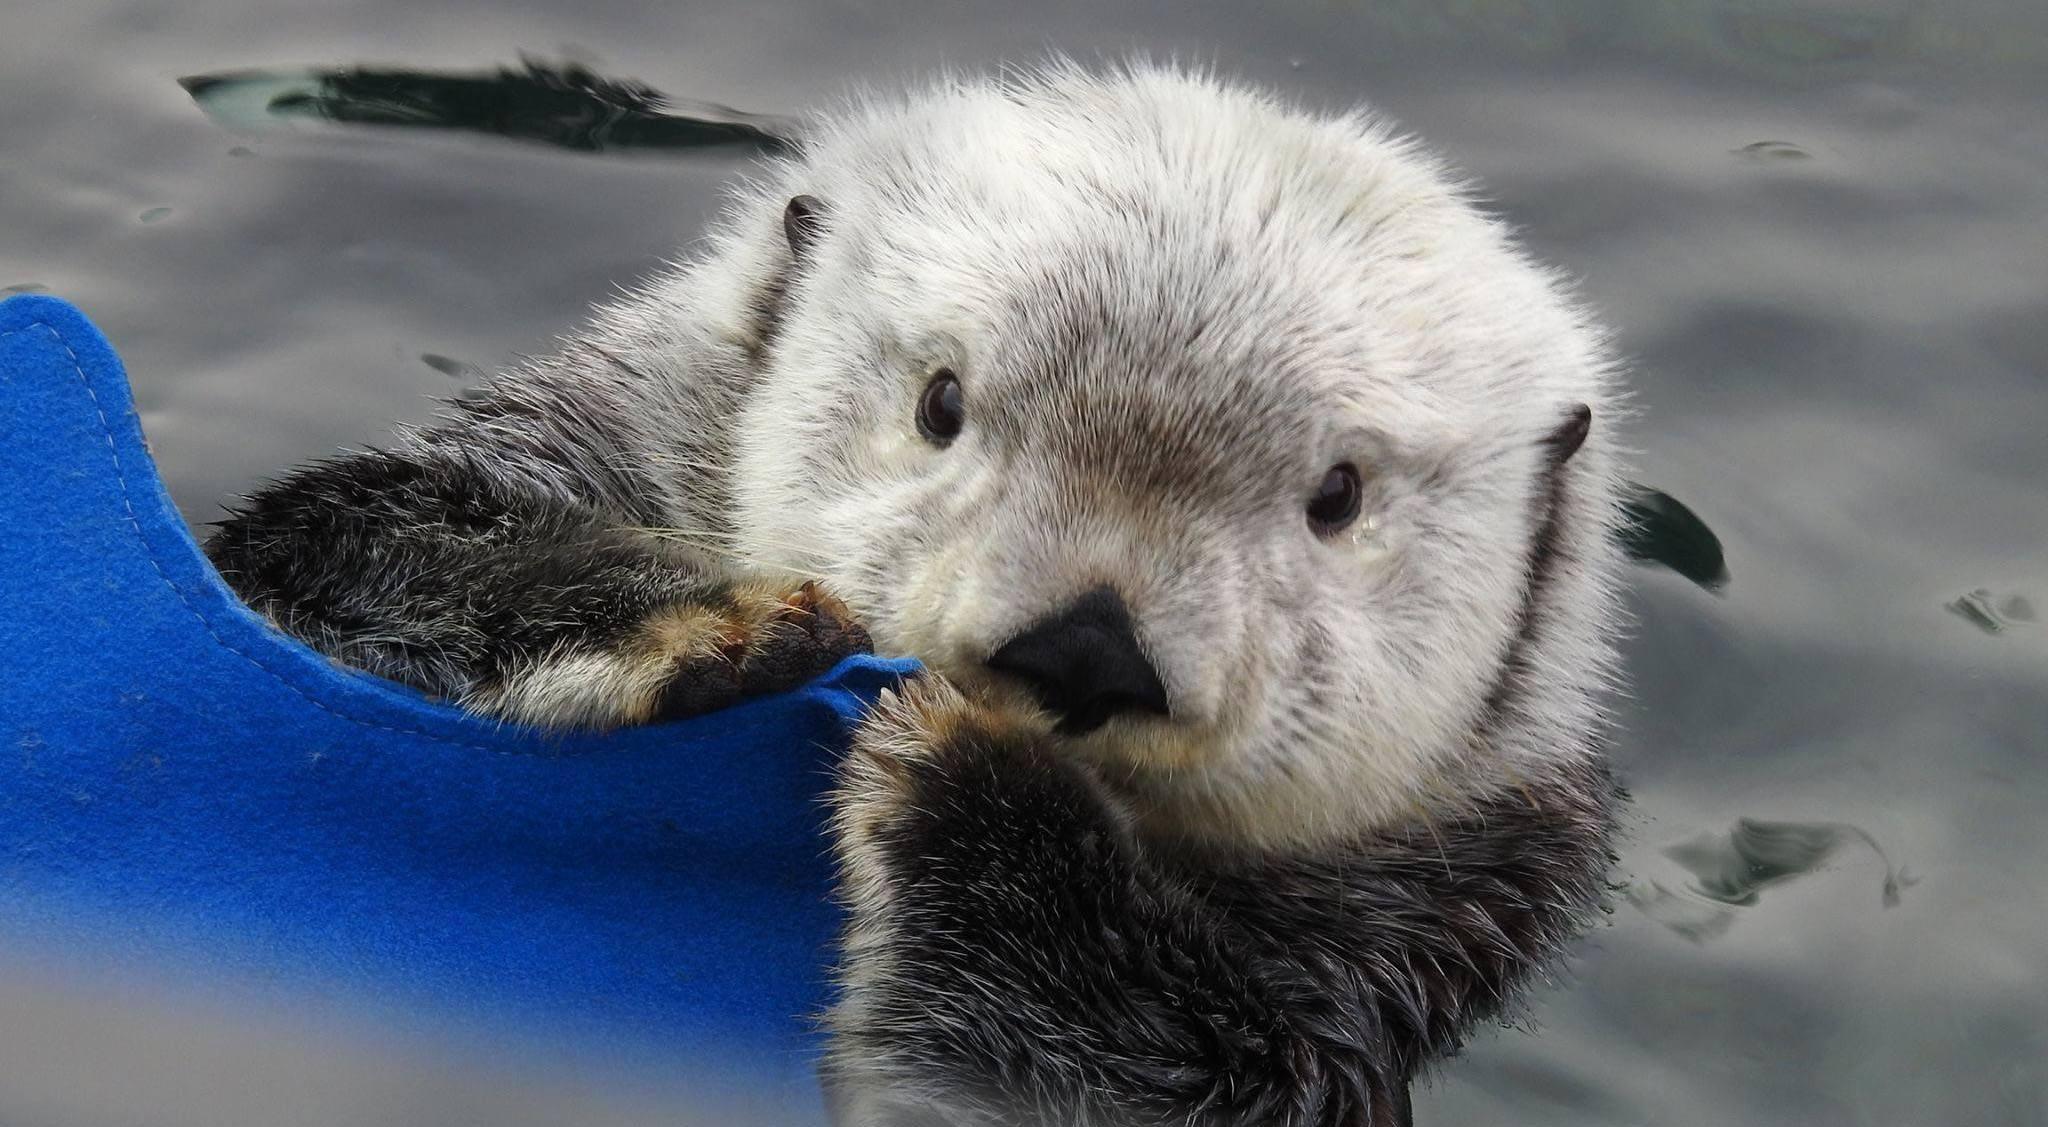 Sea otter at vancouver aquarium vancouver aquariumfacebook